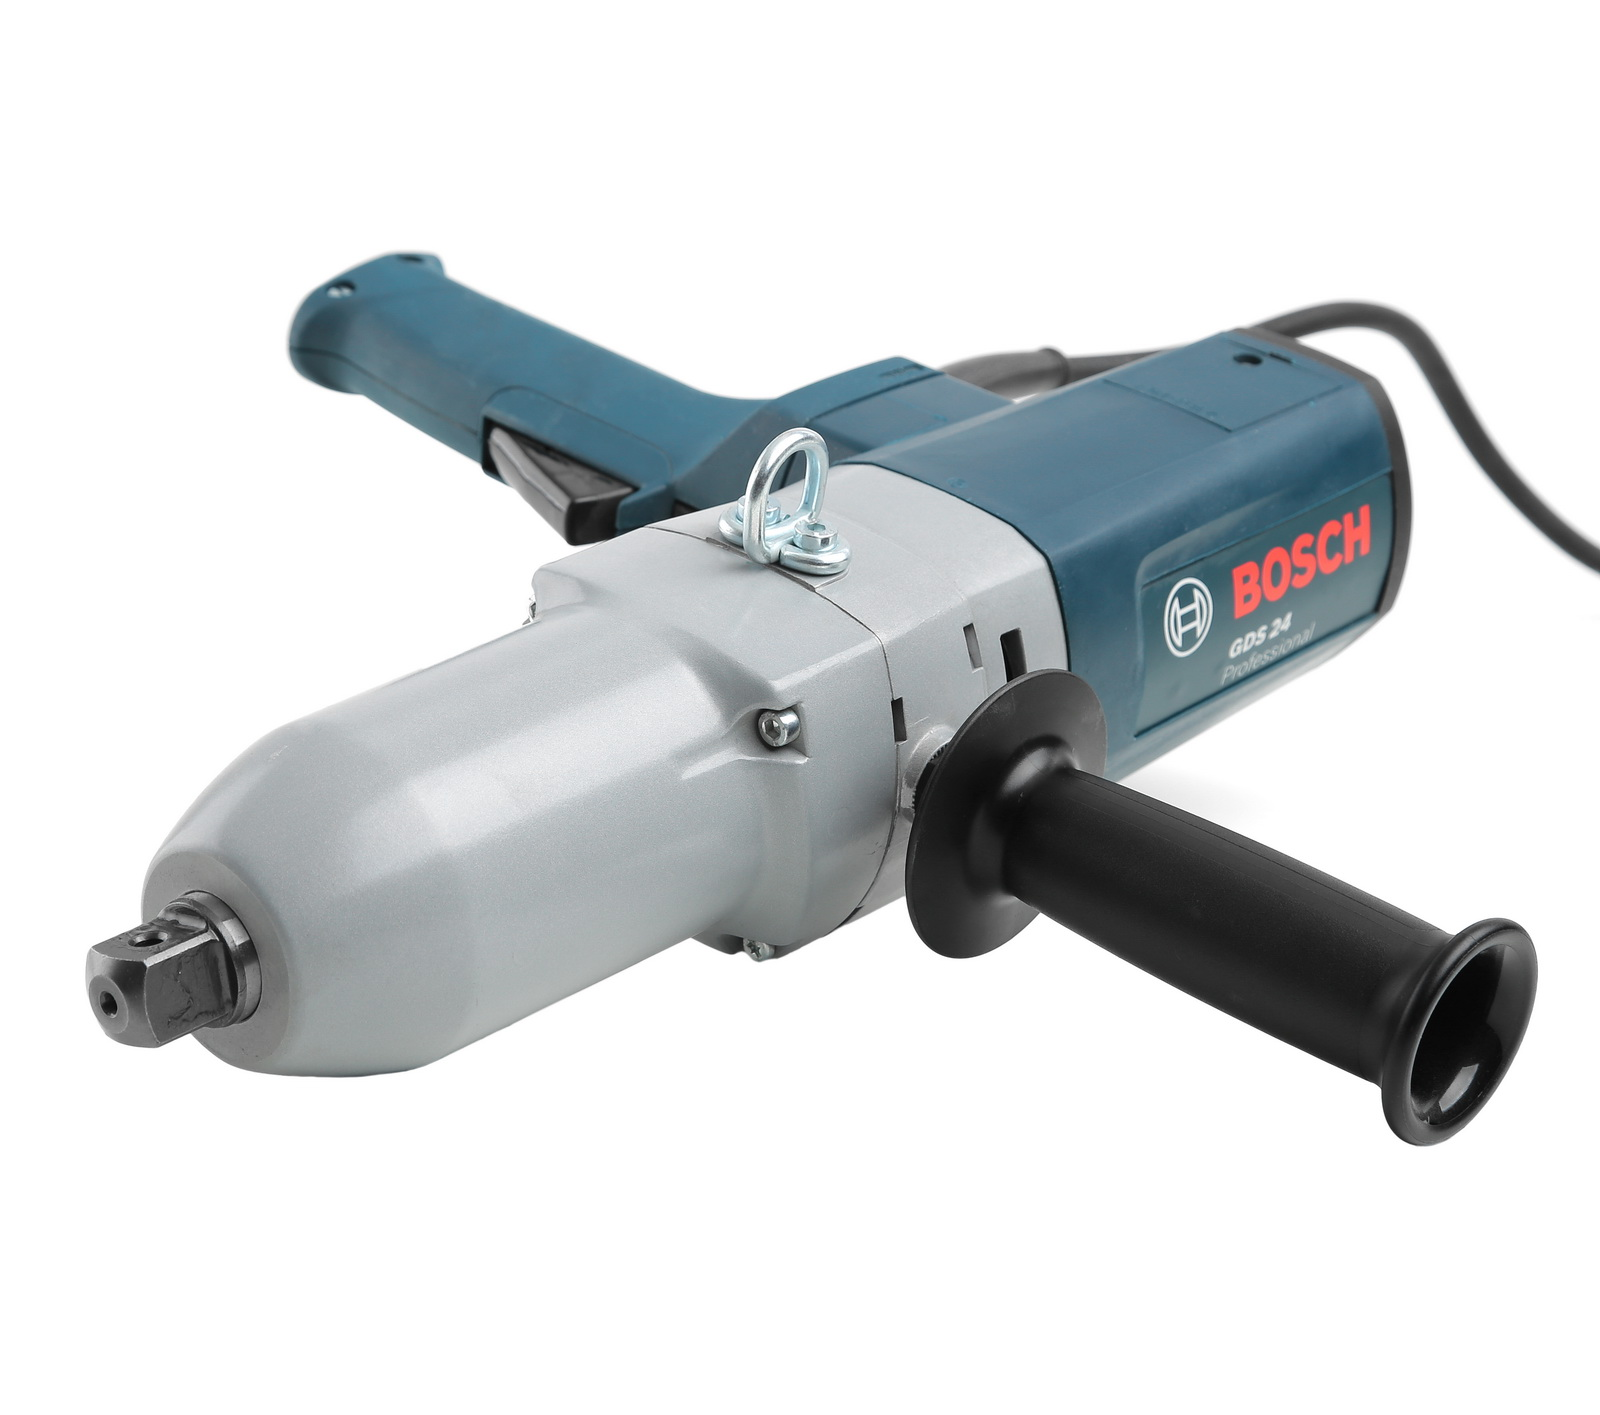 Гайковерт ударный Bosch Gds 24 (0.601.434.108) гайковерт электрический bosch gds 30 0 601 435 108 ударный